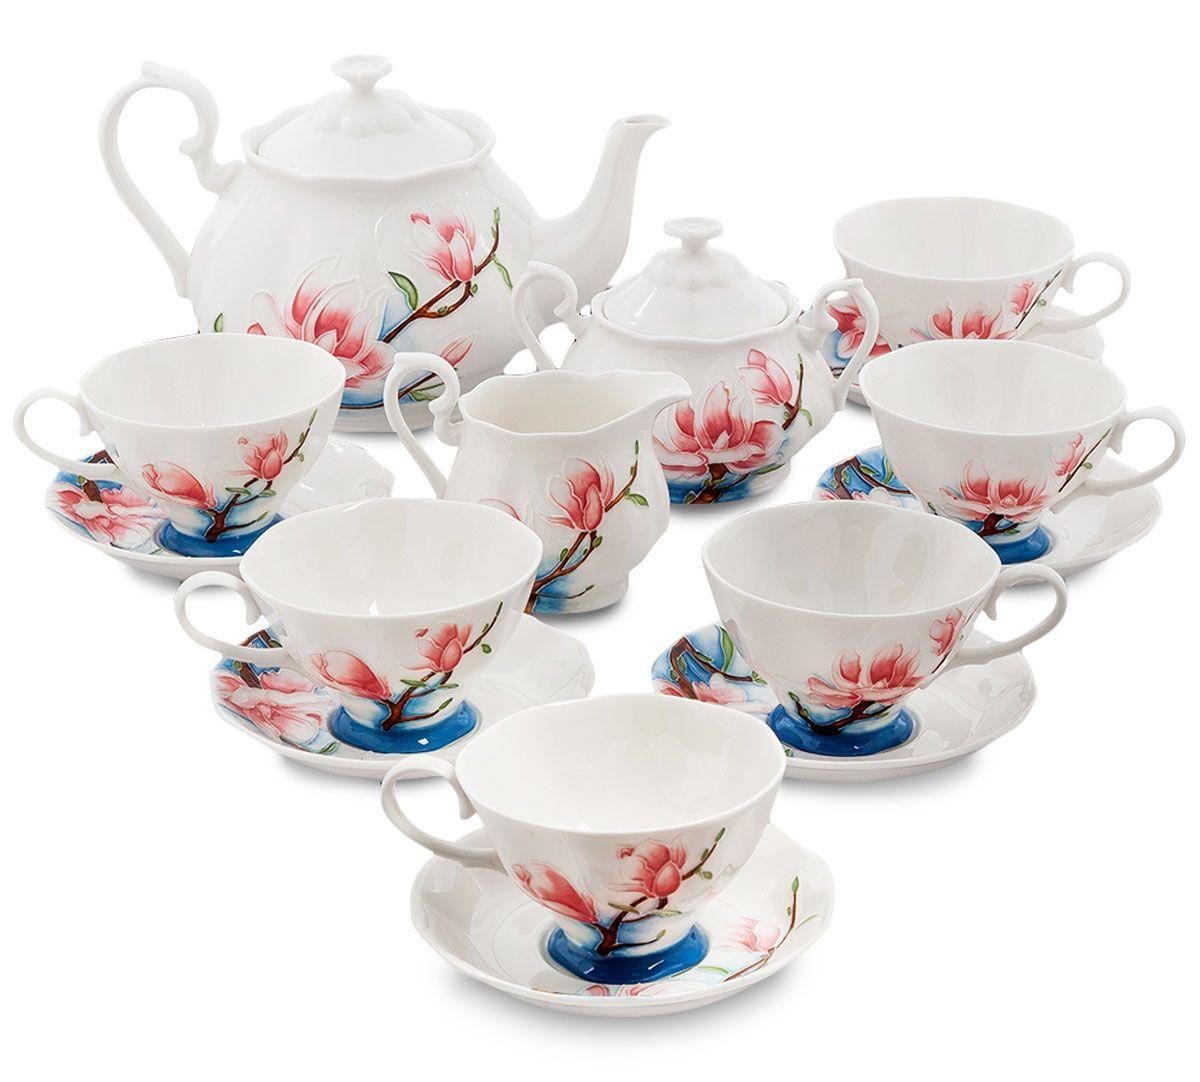 Сервиз чайный Pavone Цветущая сакура, 15 предметов. 451572FS-91909Объем чайника: 1,25 лОбъем сахарницы: 400 мл Объем молочника: 250 мл Объем чашки: 200 млДиаметр блюдца: 14 см.